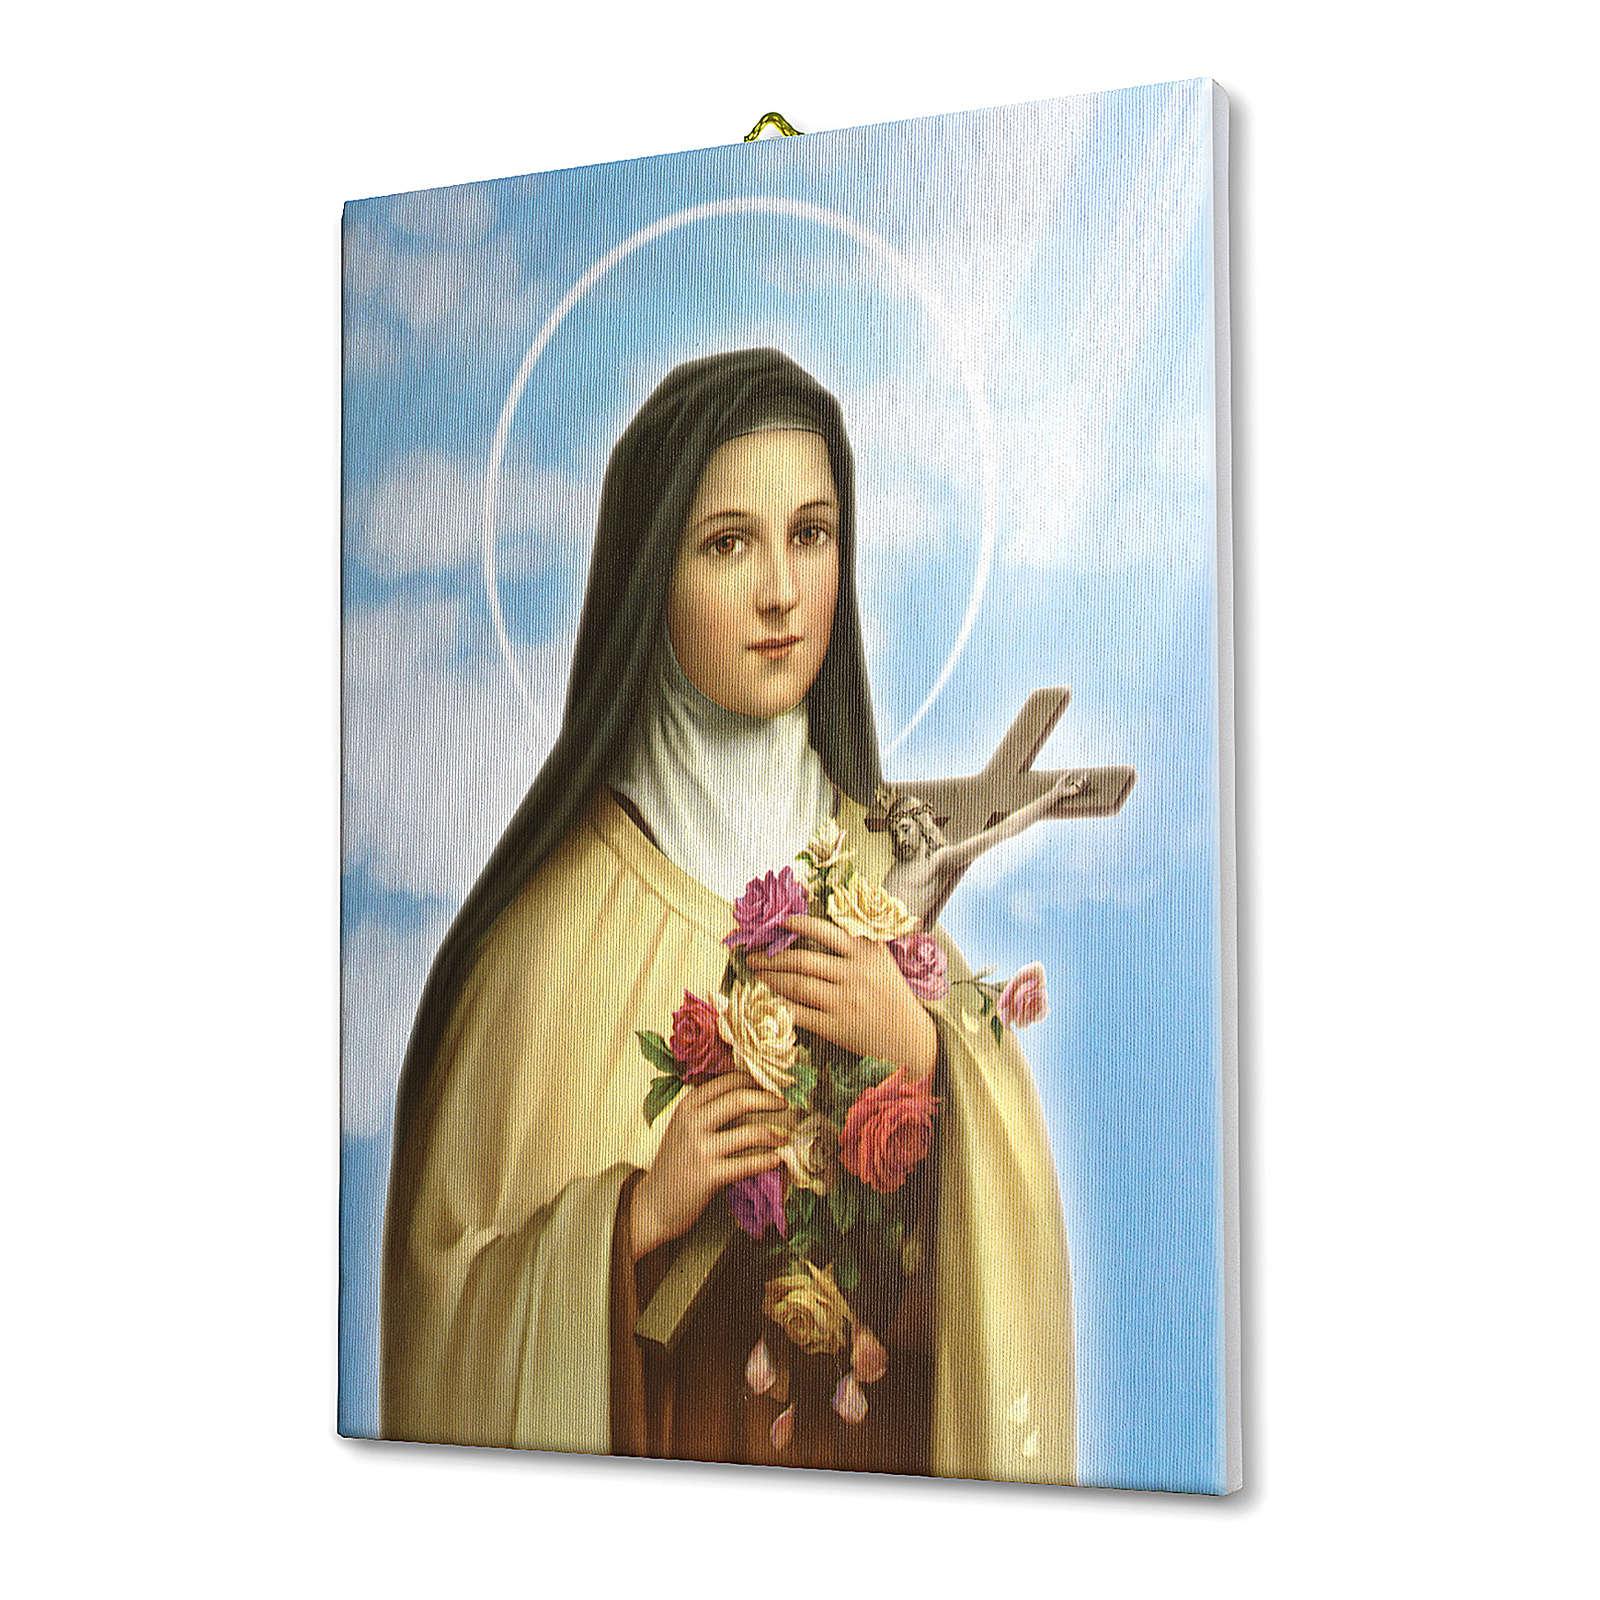 Cuadro sobre tela pictórica Santa Teresa del Niño Jesús 40x30 cm 3